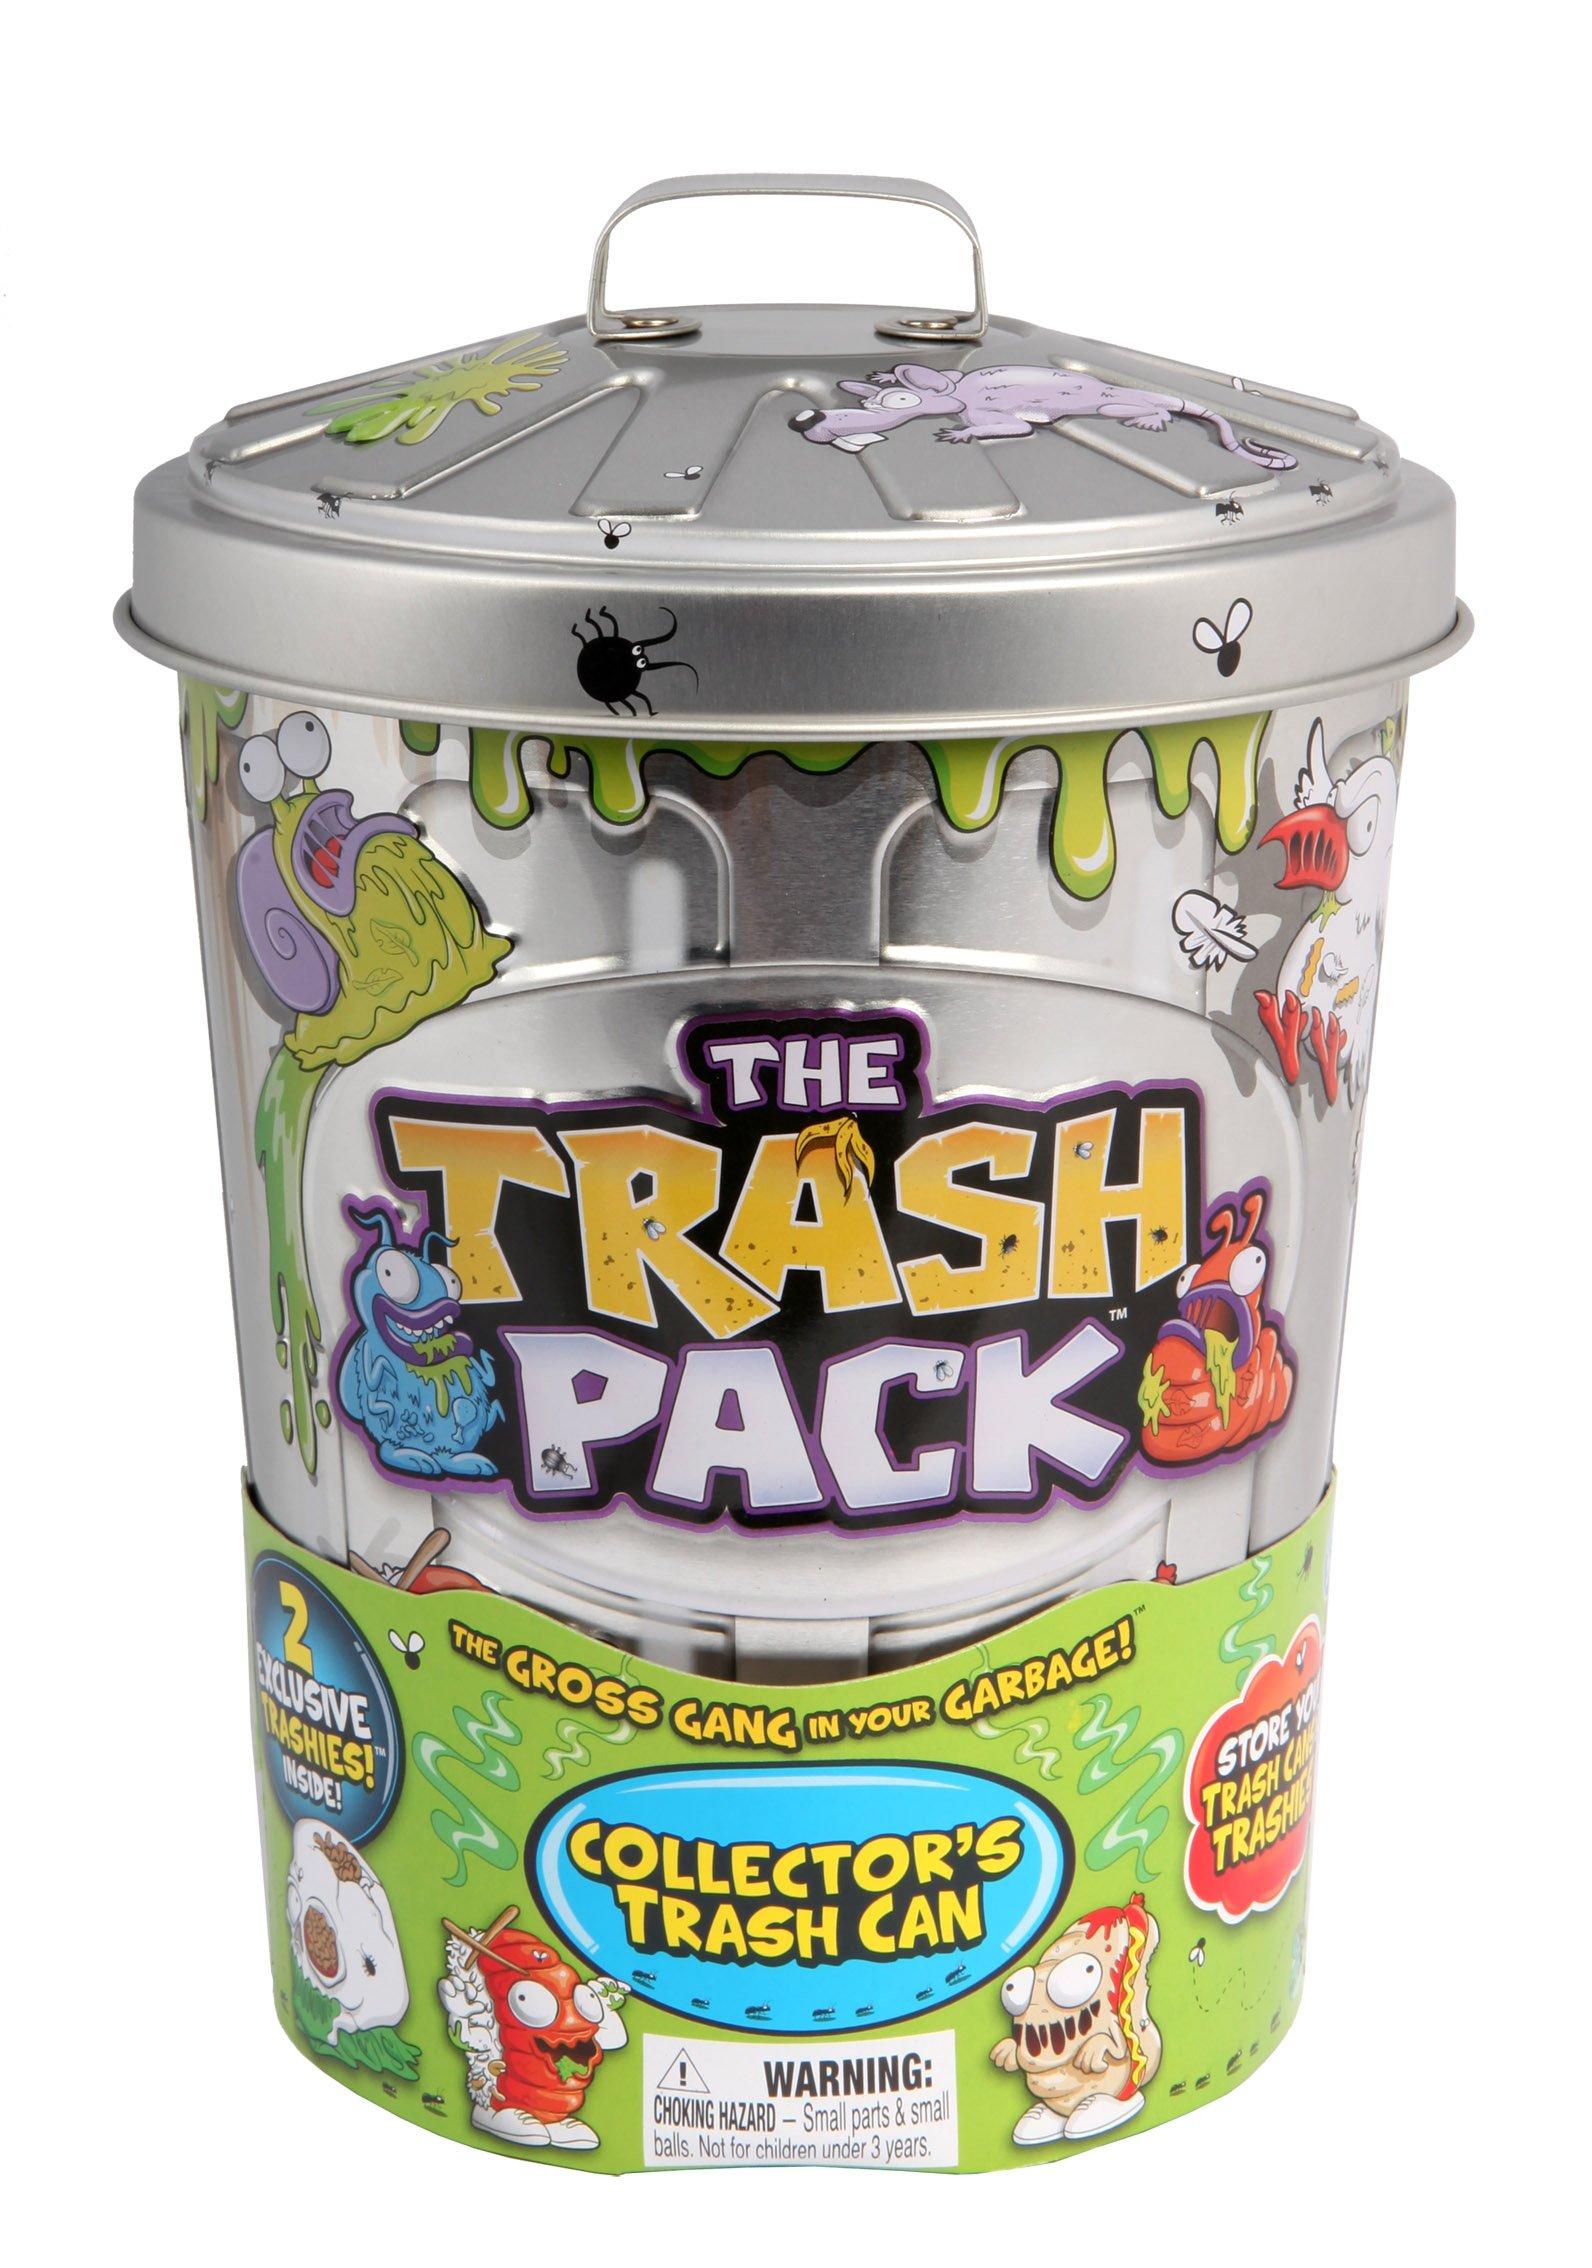 Trash Pack Collectors Trash Can 2